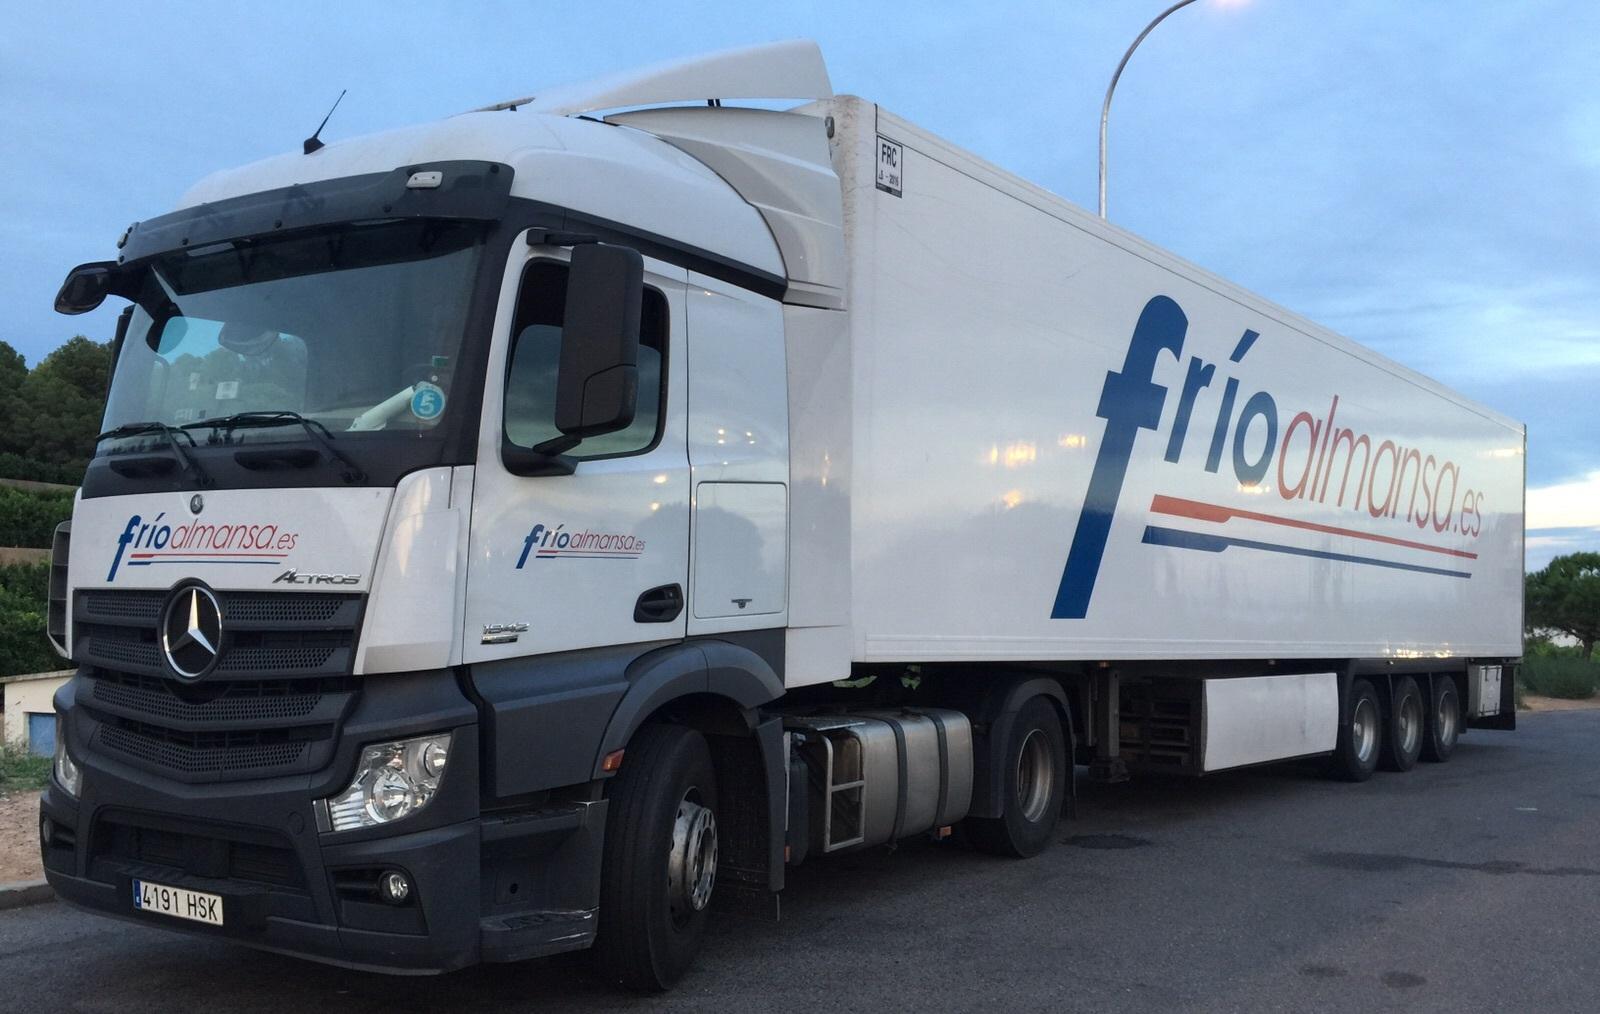 http://transporteinternacionalalmansa.es/wp-content/uploads/2021/03/TRANSPORTE-NACIONAL-E-INTERNACIONAL-TEMPERATURA-CONTROLADA-TODA-EUROPA-BELGICA-HOLANDA-PAISES-BAJOS-FRANCIA-ITALIA-ESLOVENIA-AUSTRIA-ALEMANIA-EXPORT.jpg